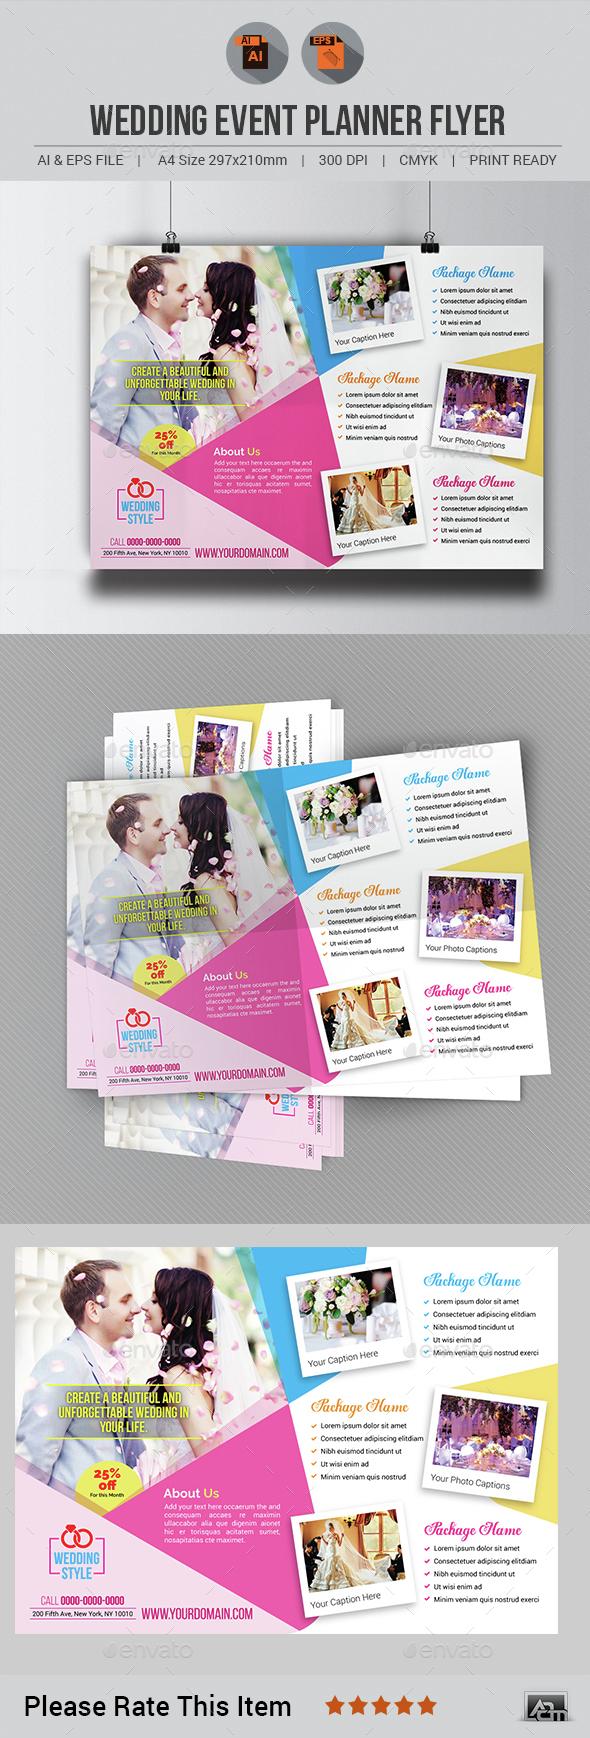 Wedding Event Planner Flyer - Corporate Flyers